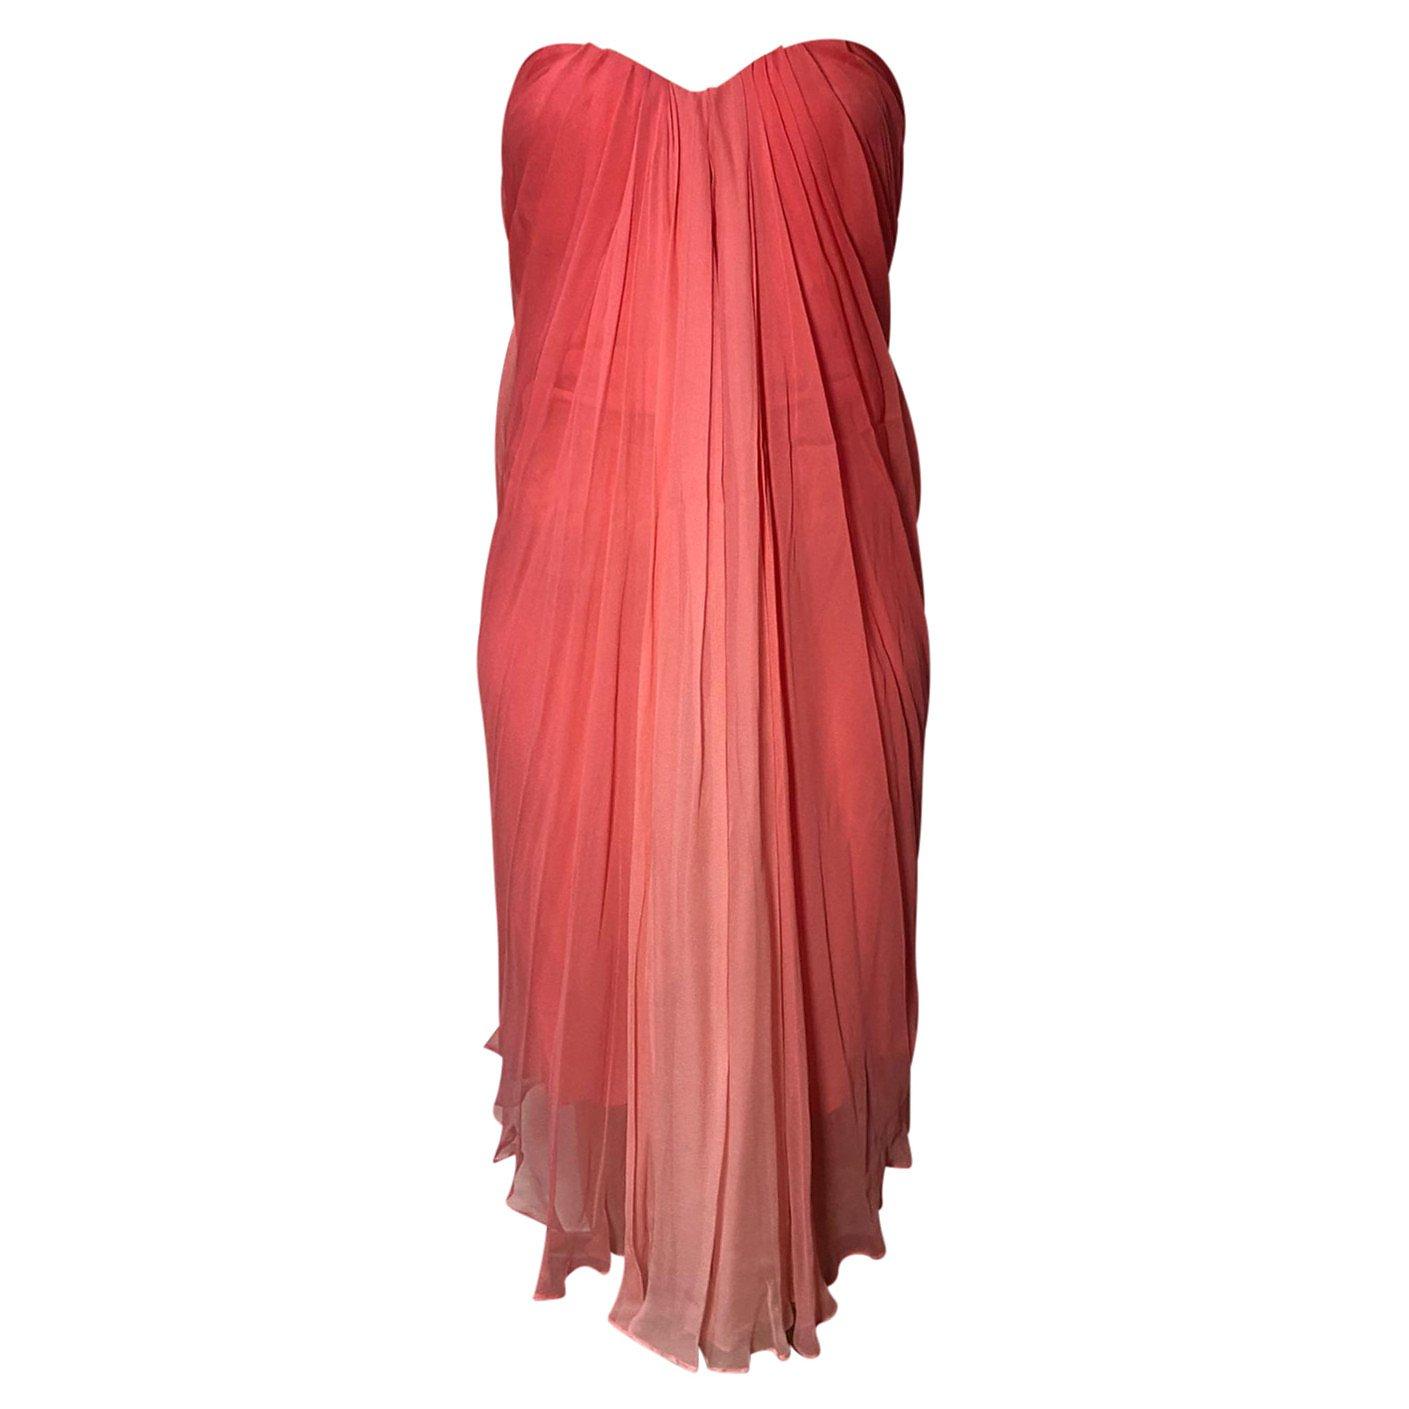 Alexander McQueen Sheer Ombré Corset Dress